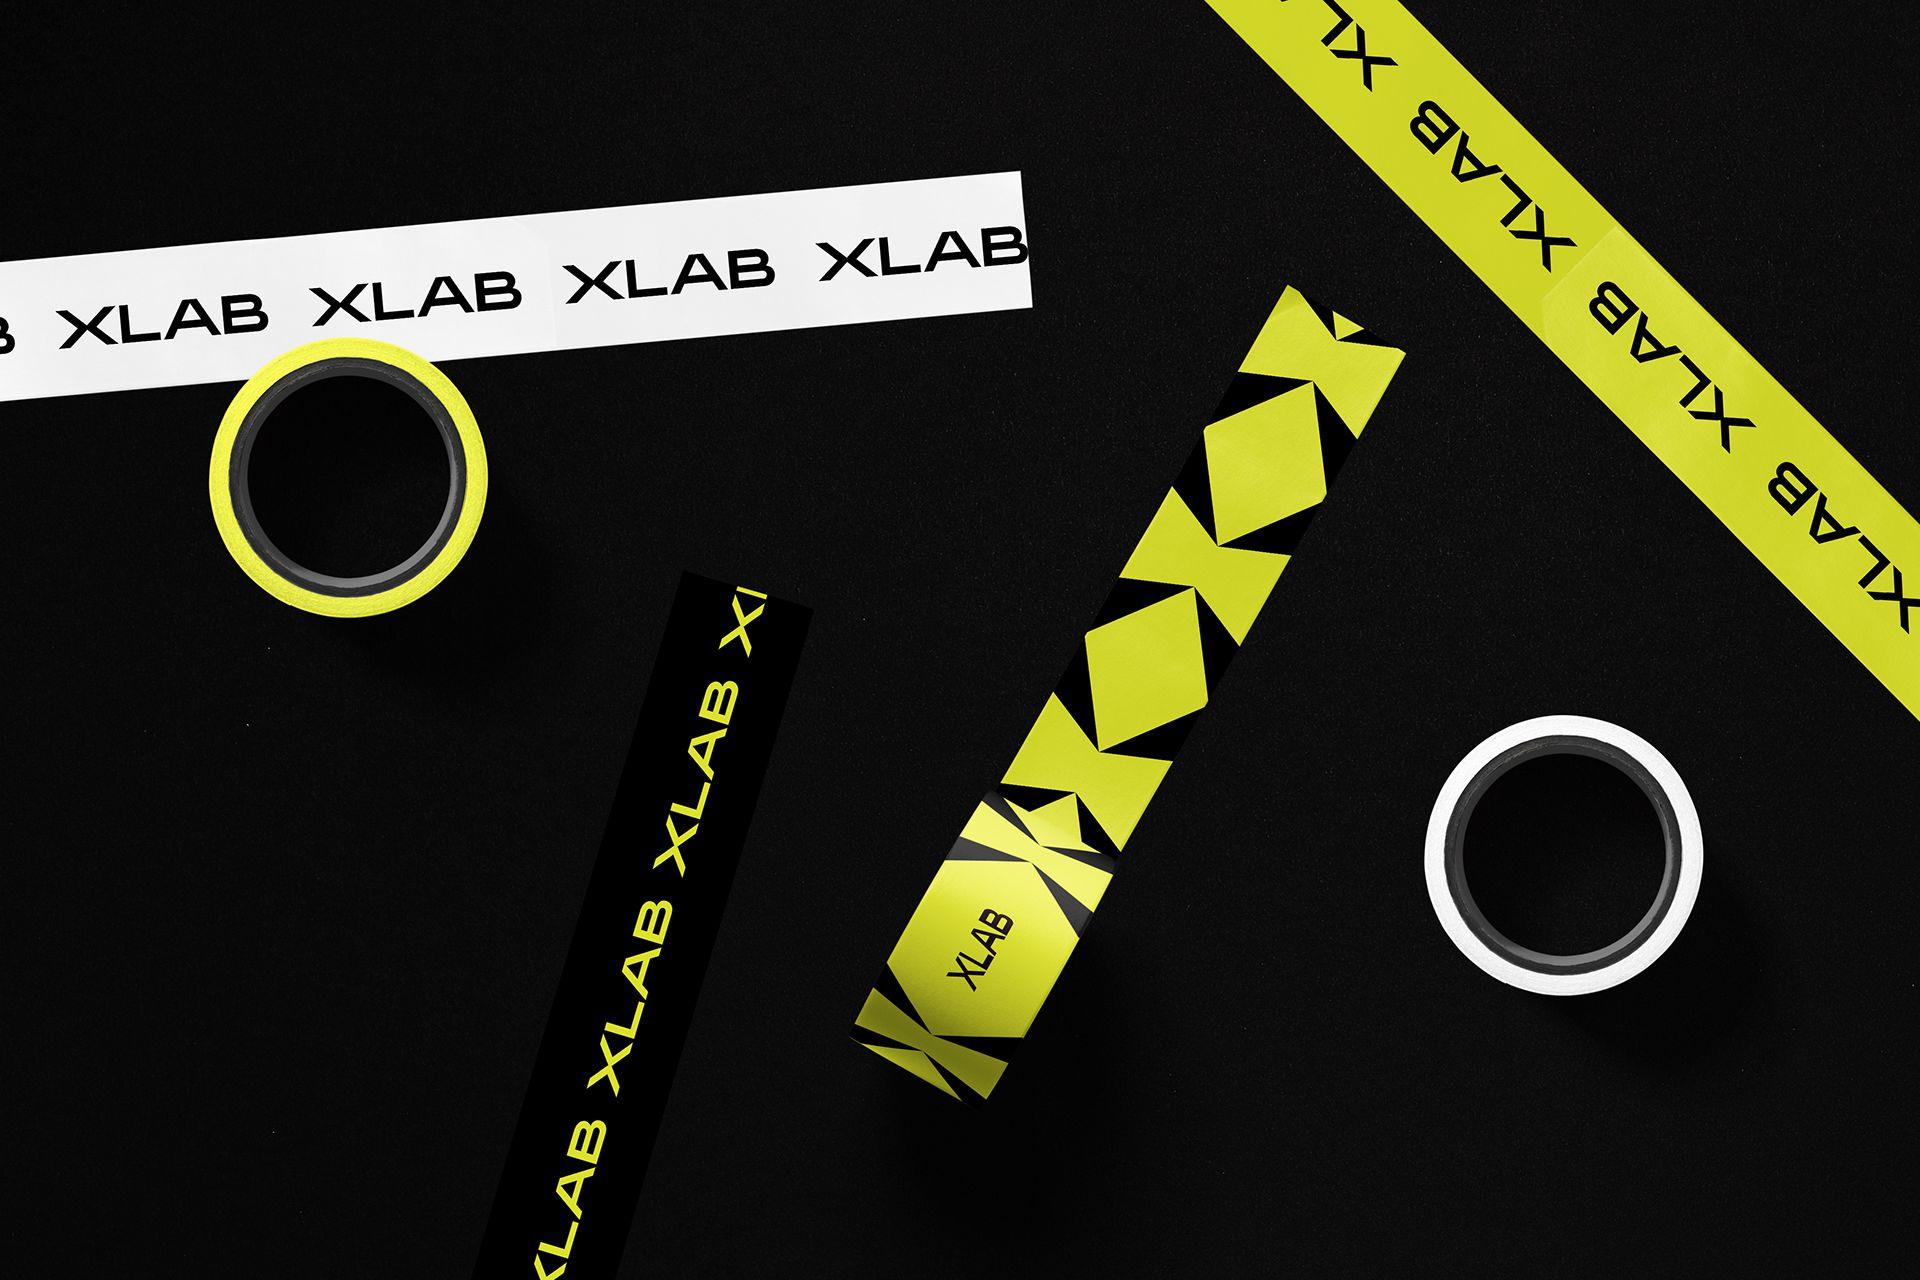 Xlab - Case study - Tape